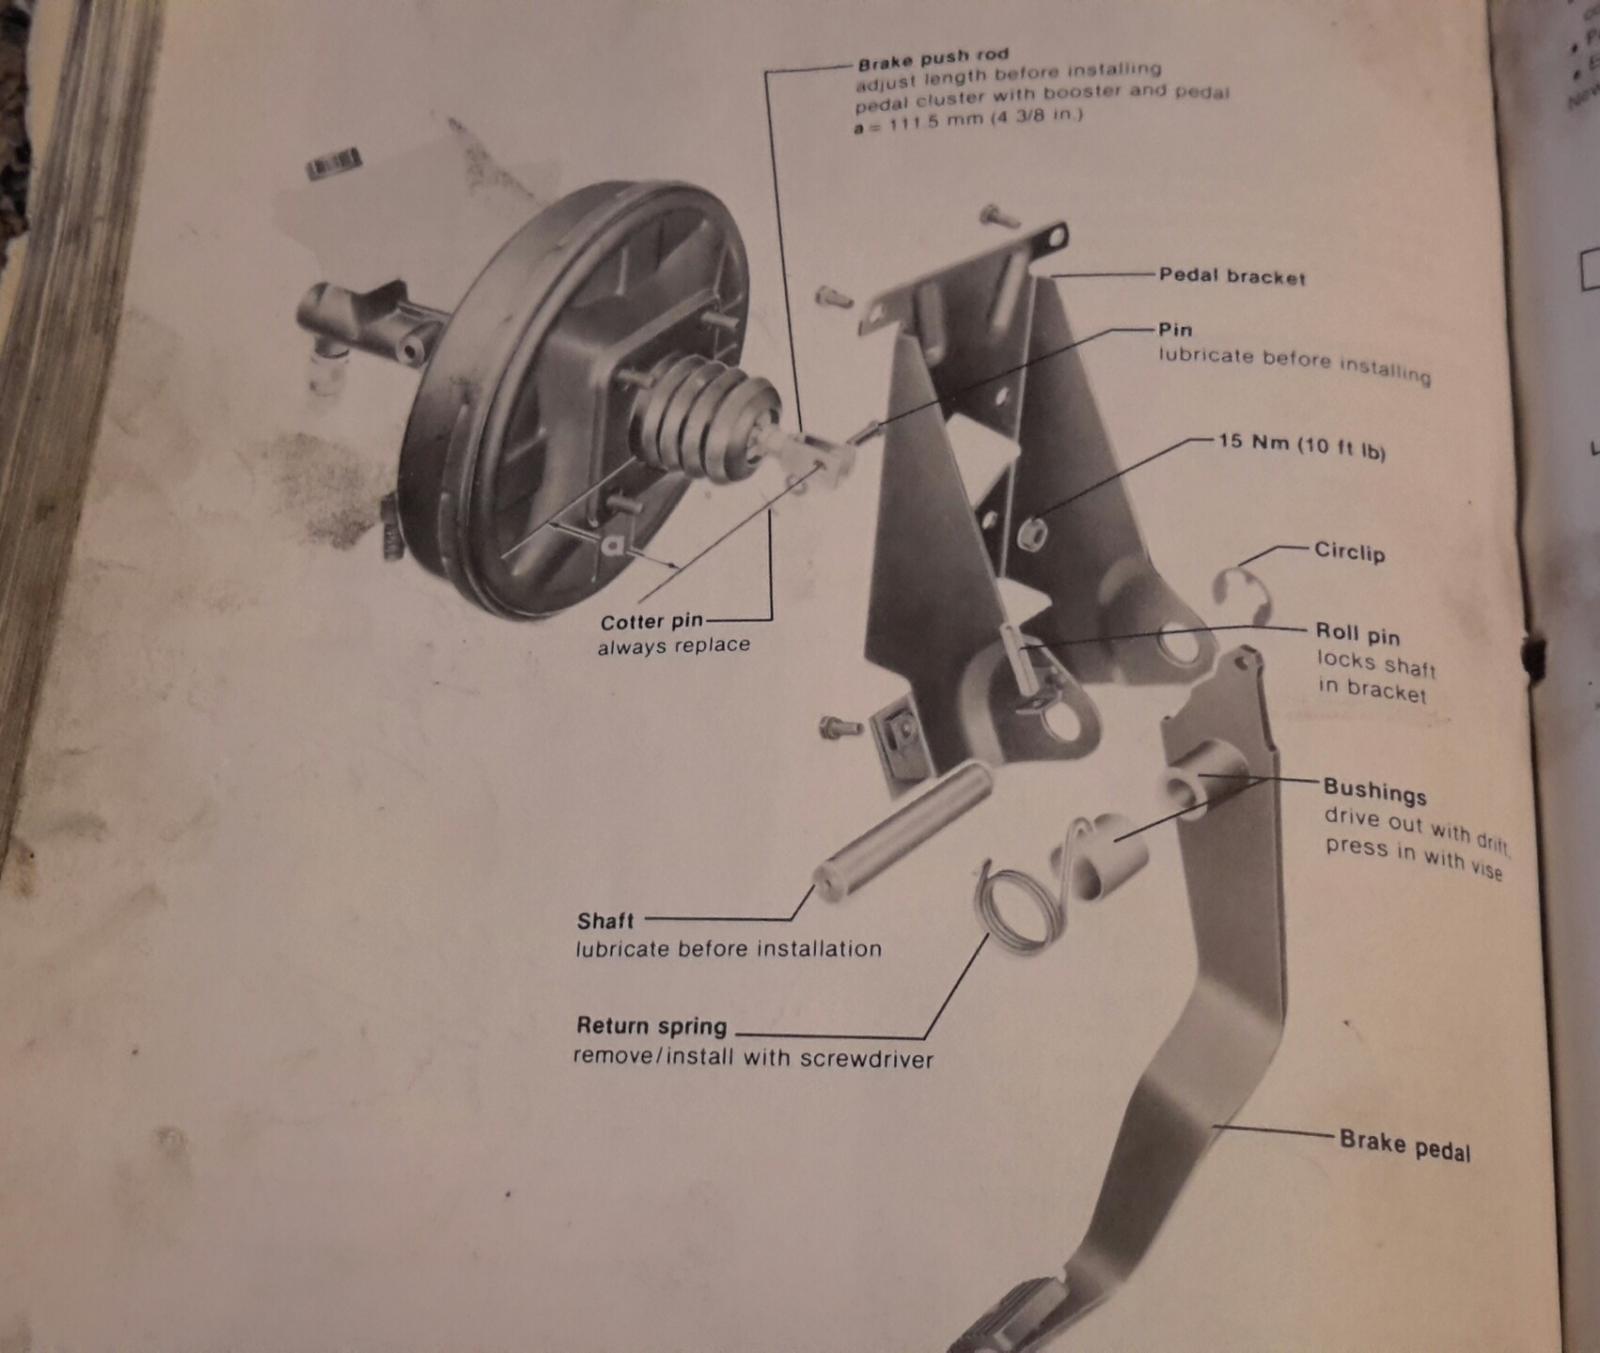 Brake or Clutch Pedal Return Spring